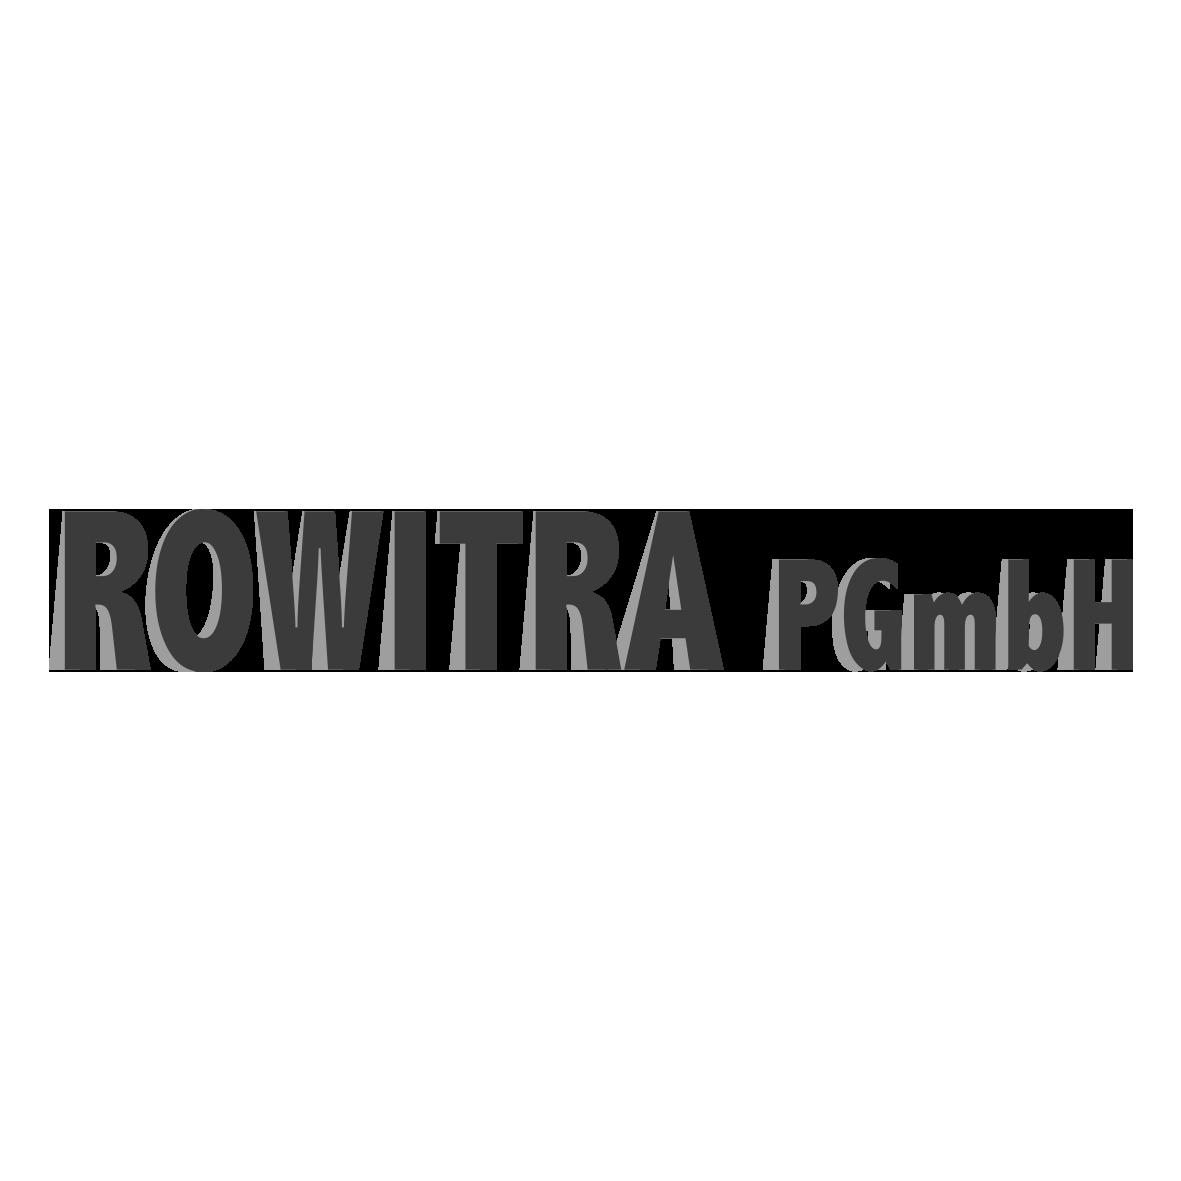 Rowitra